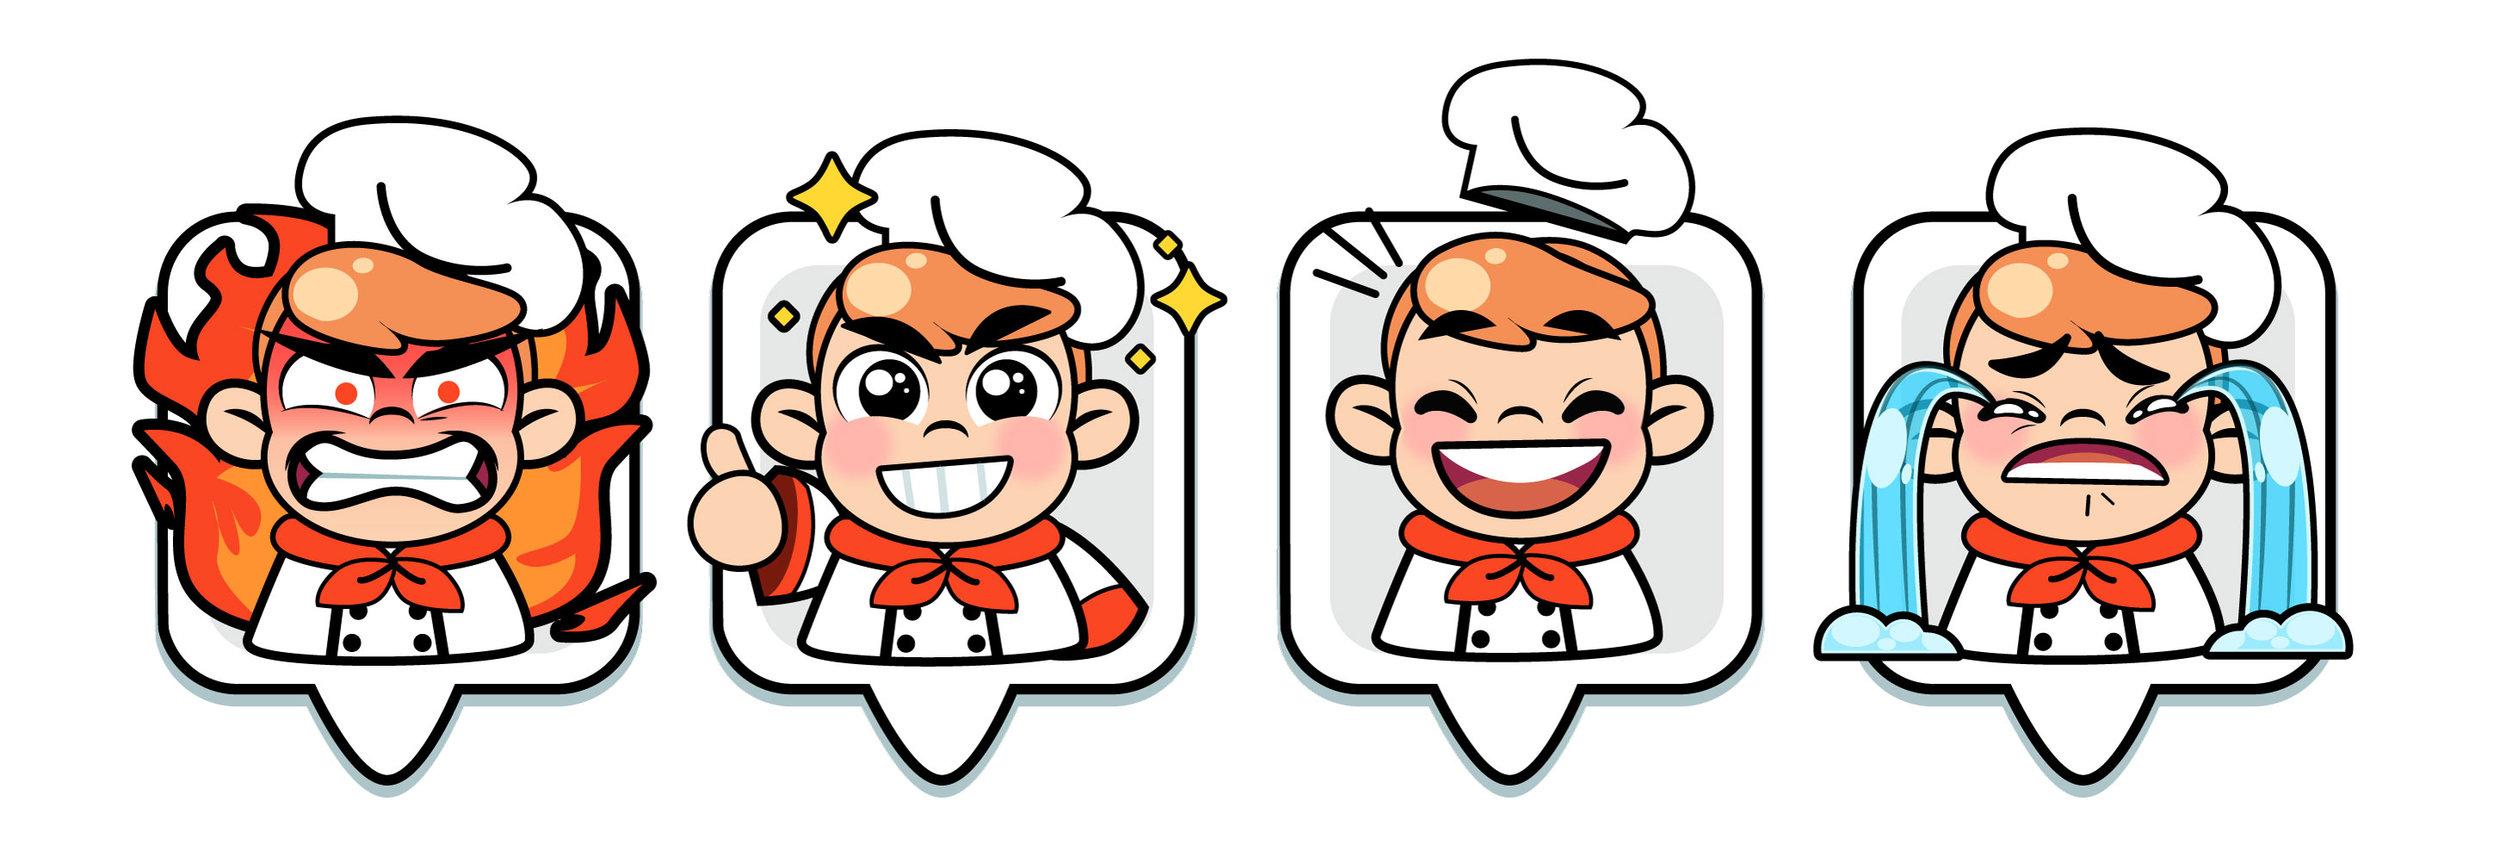 emoji_row_dish (1).jpg